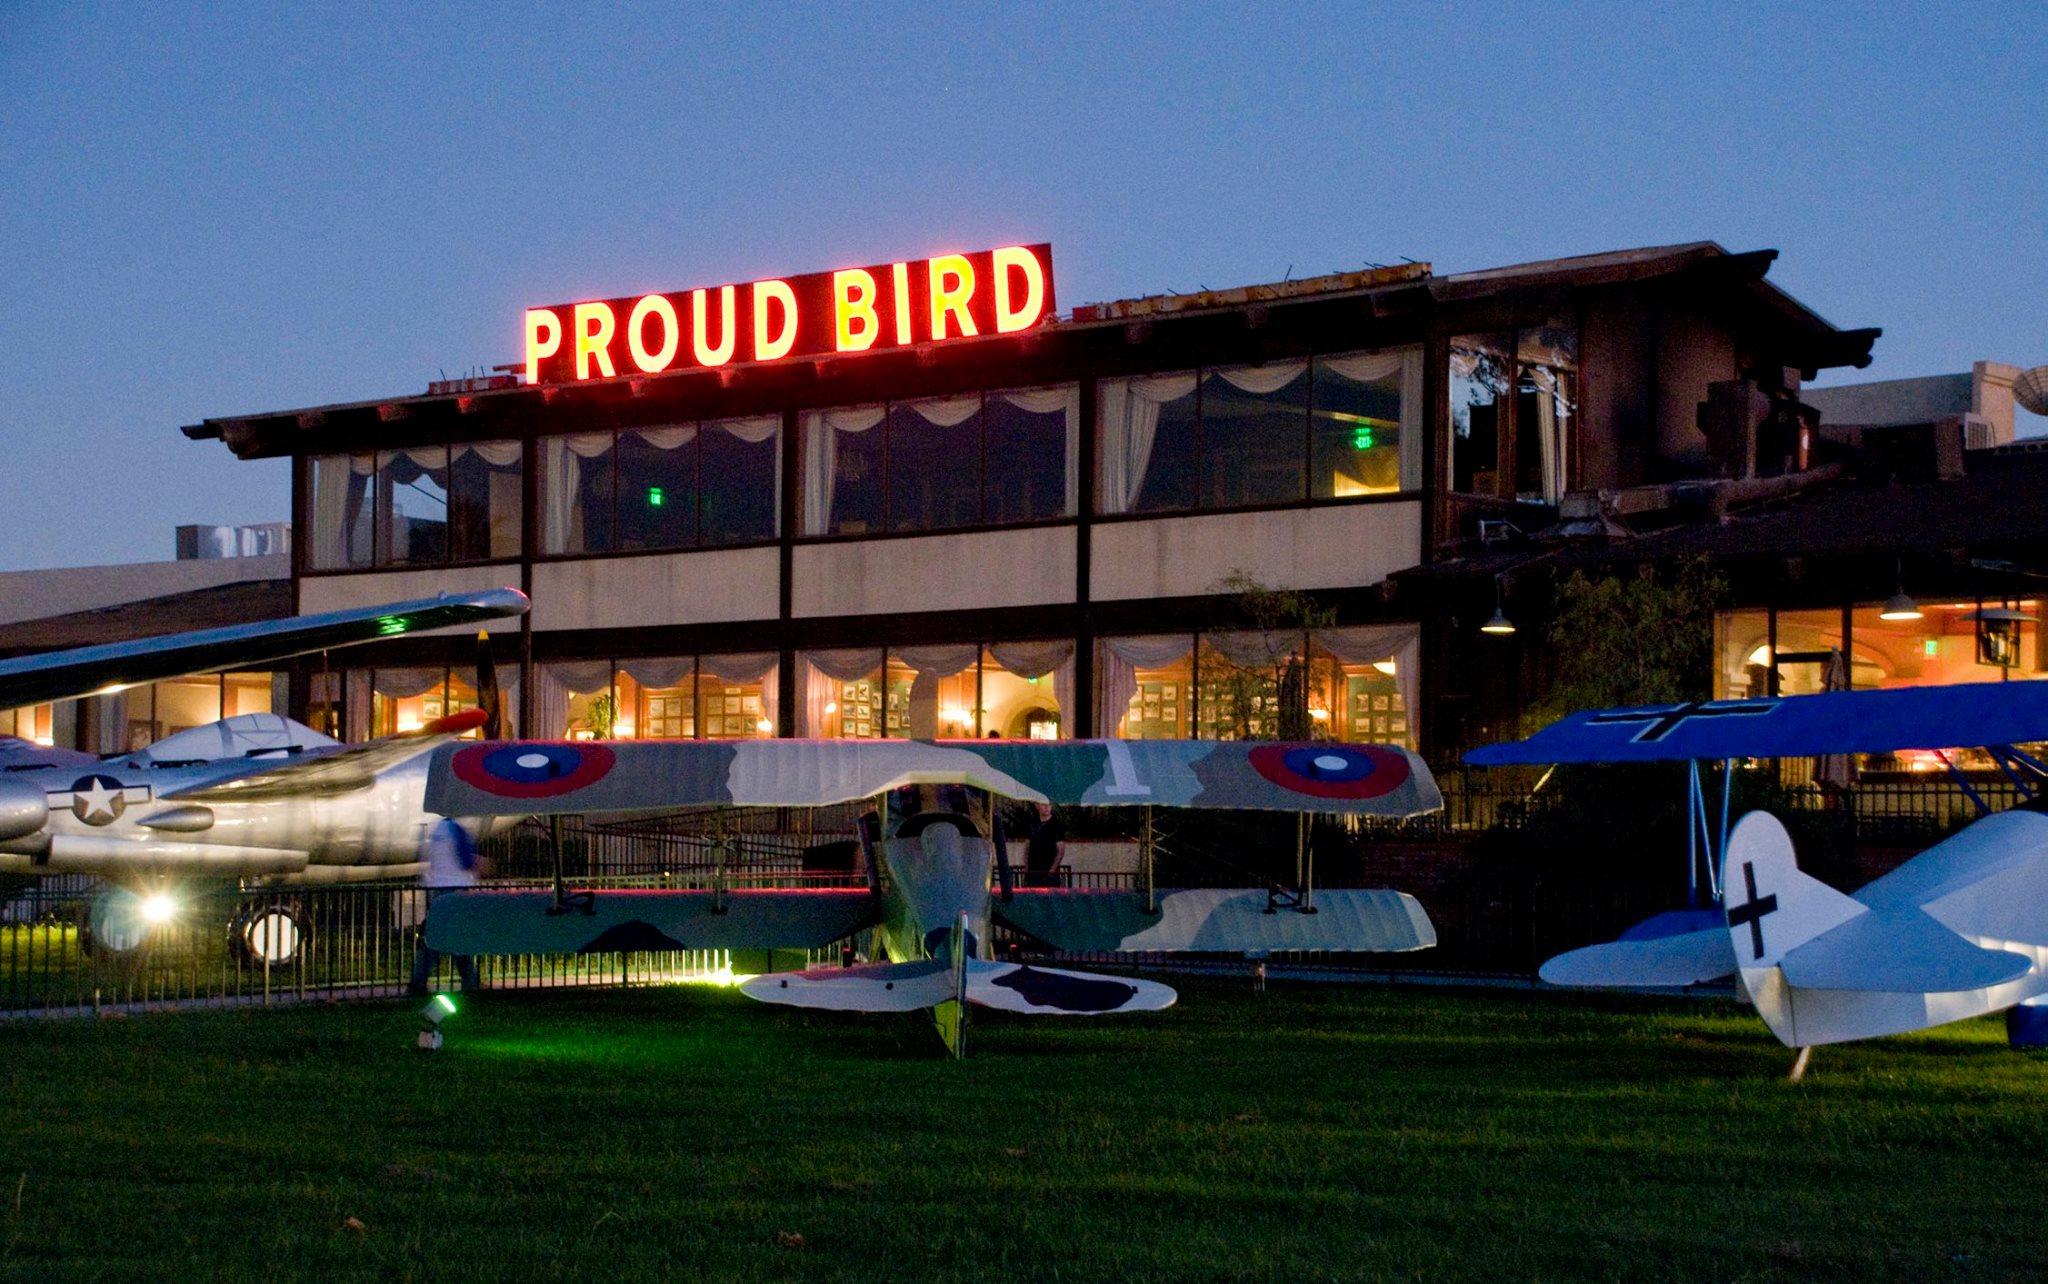 The Proud Bird Restaurant